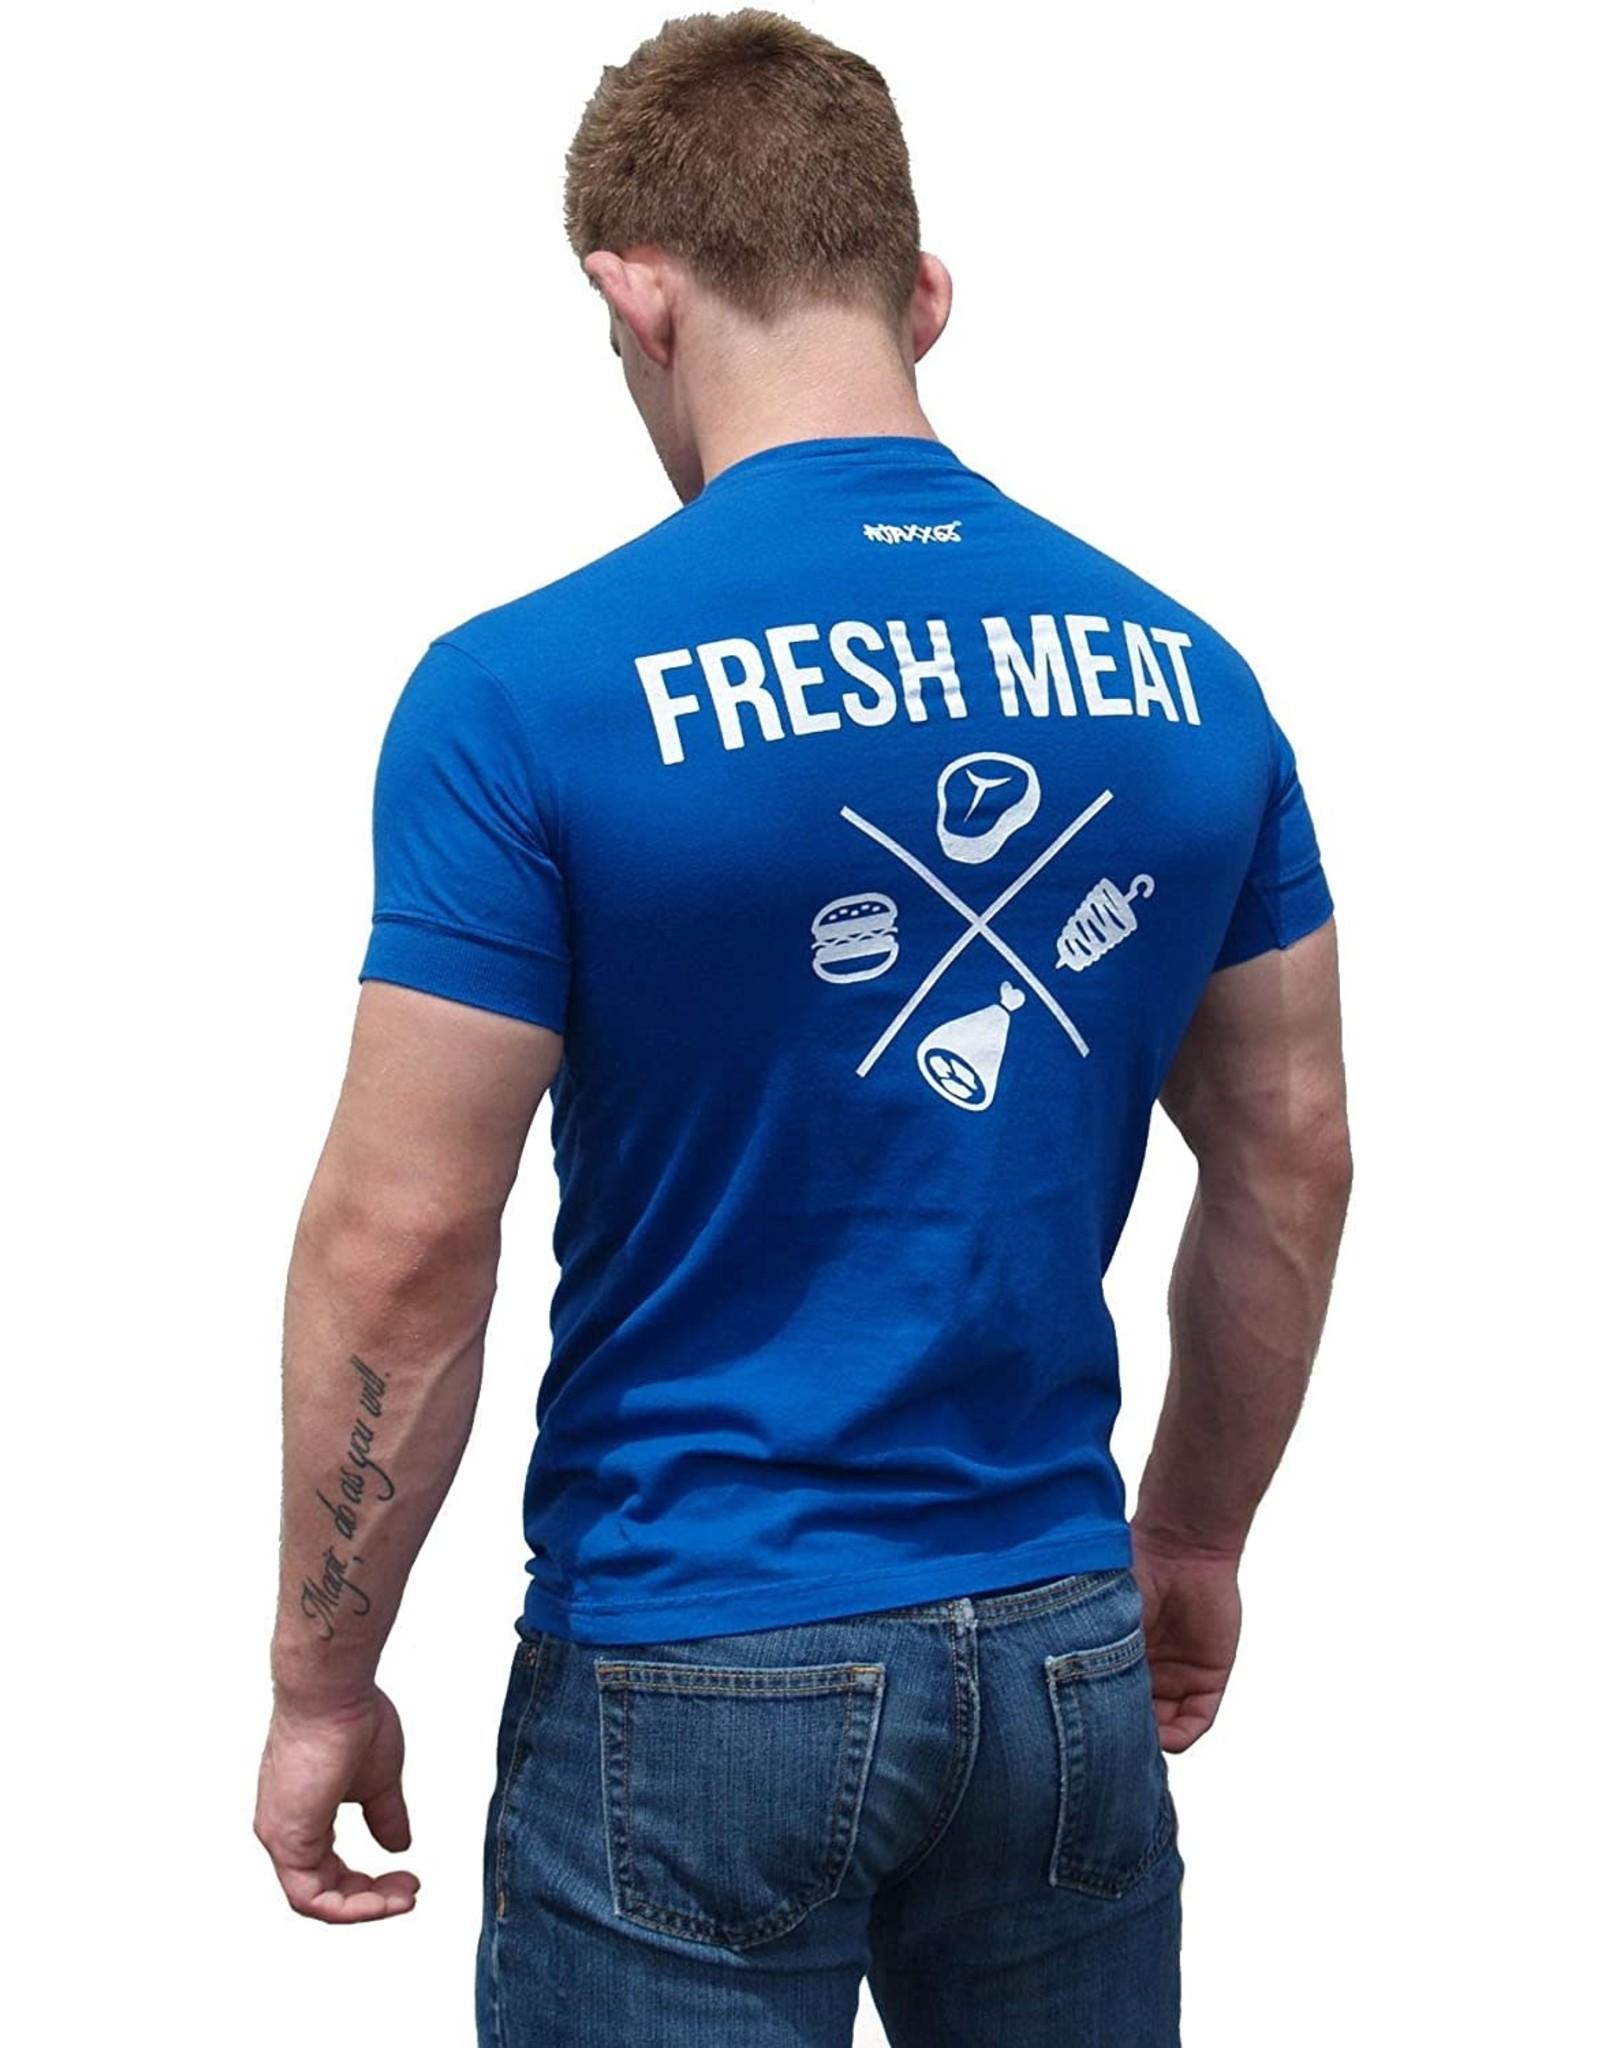 ajaxx63 ajaxx63 Fresh Meat Tee